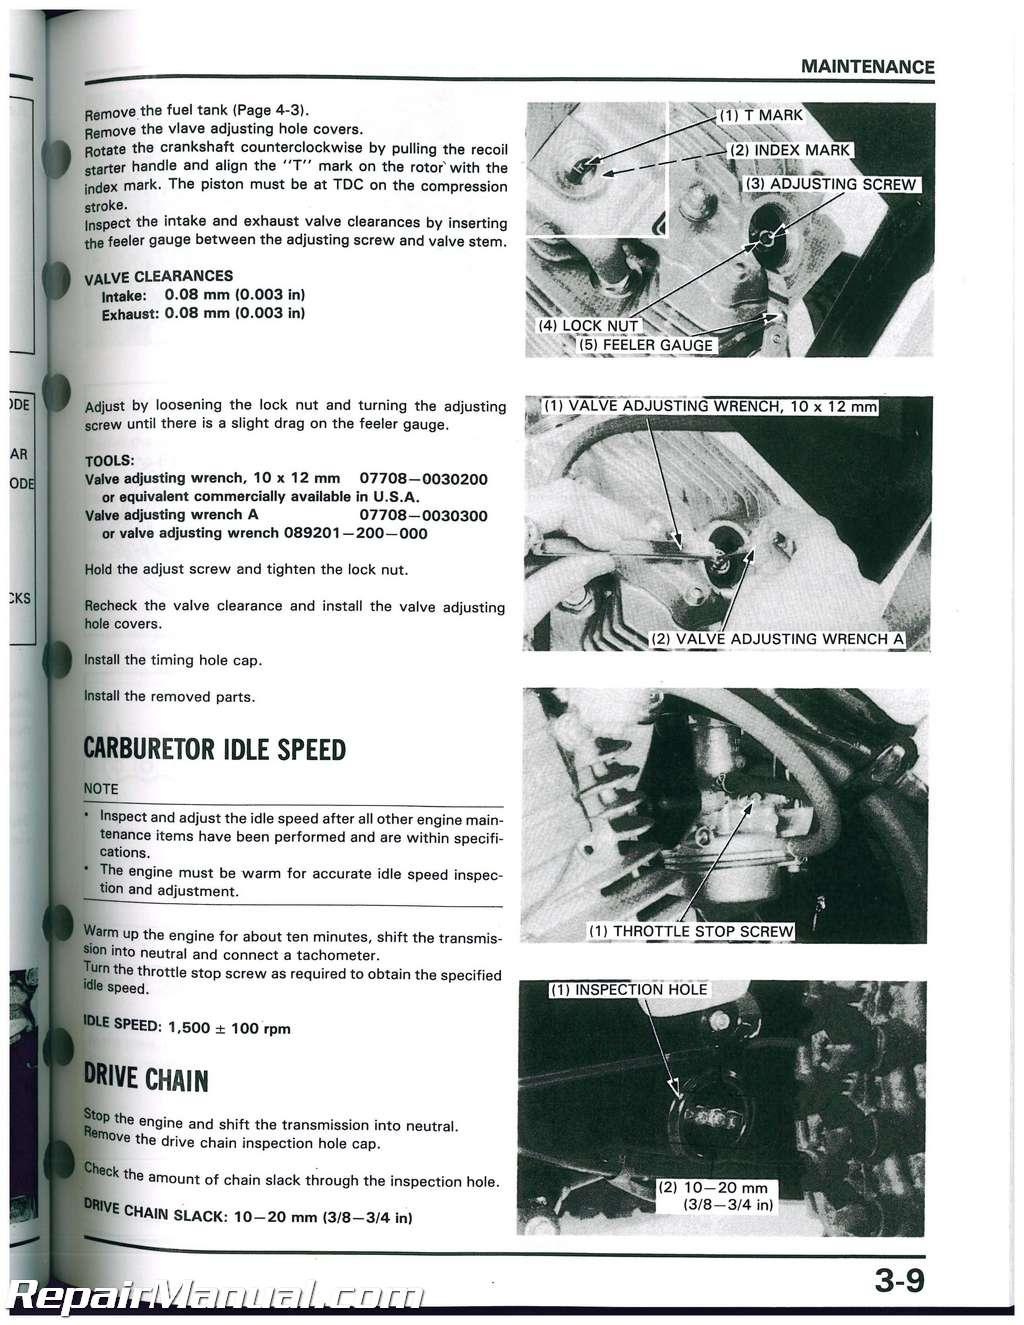 1986 1987 Honda ATC125M Three Wheeler Service Manual